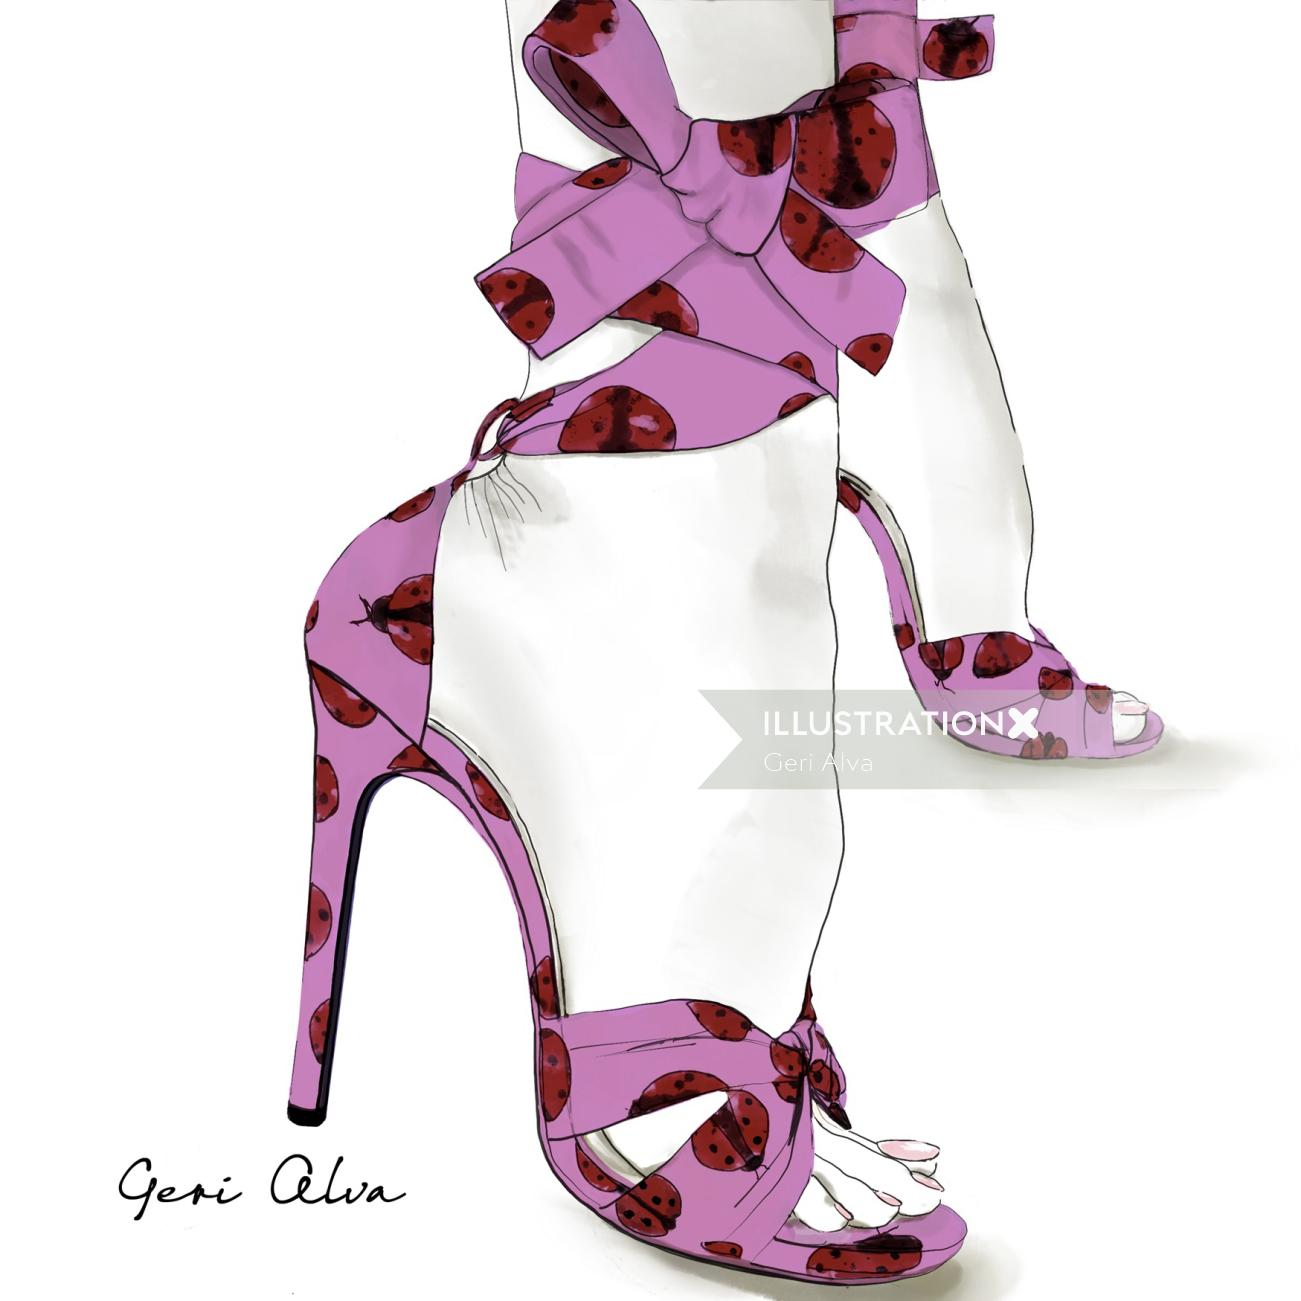 fashion, beauty, pencil illustrations, digital illustrations, high heels ladybug pumps collection, l